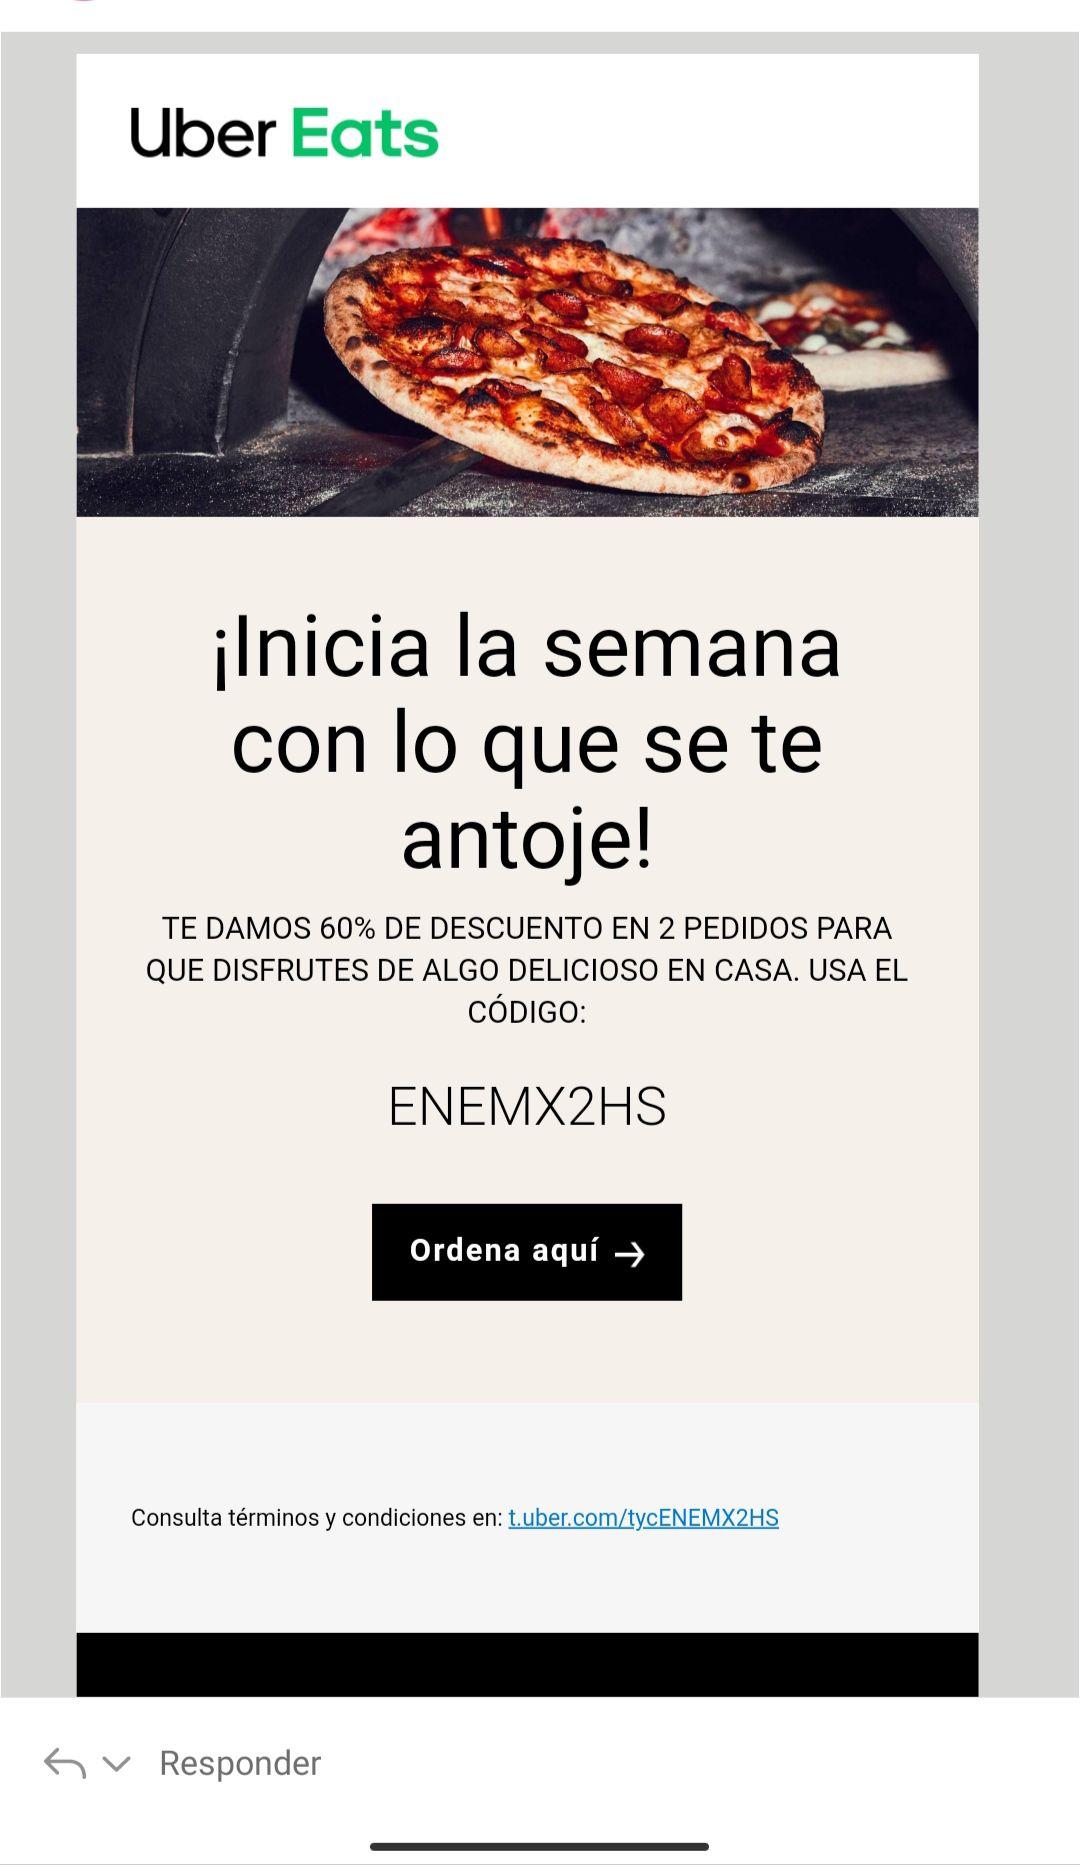 Uber Eats: 60% de Descuento en 2 pedidos